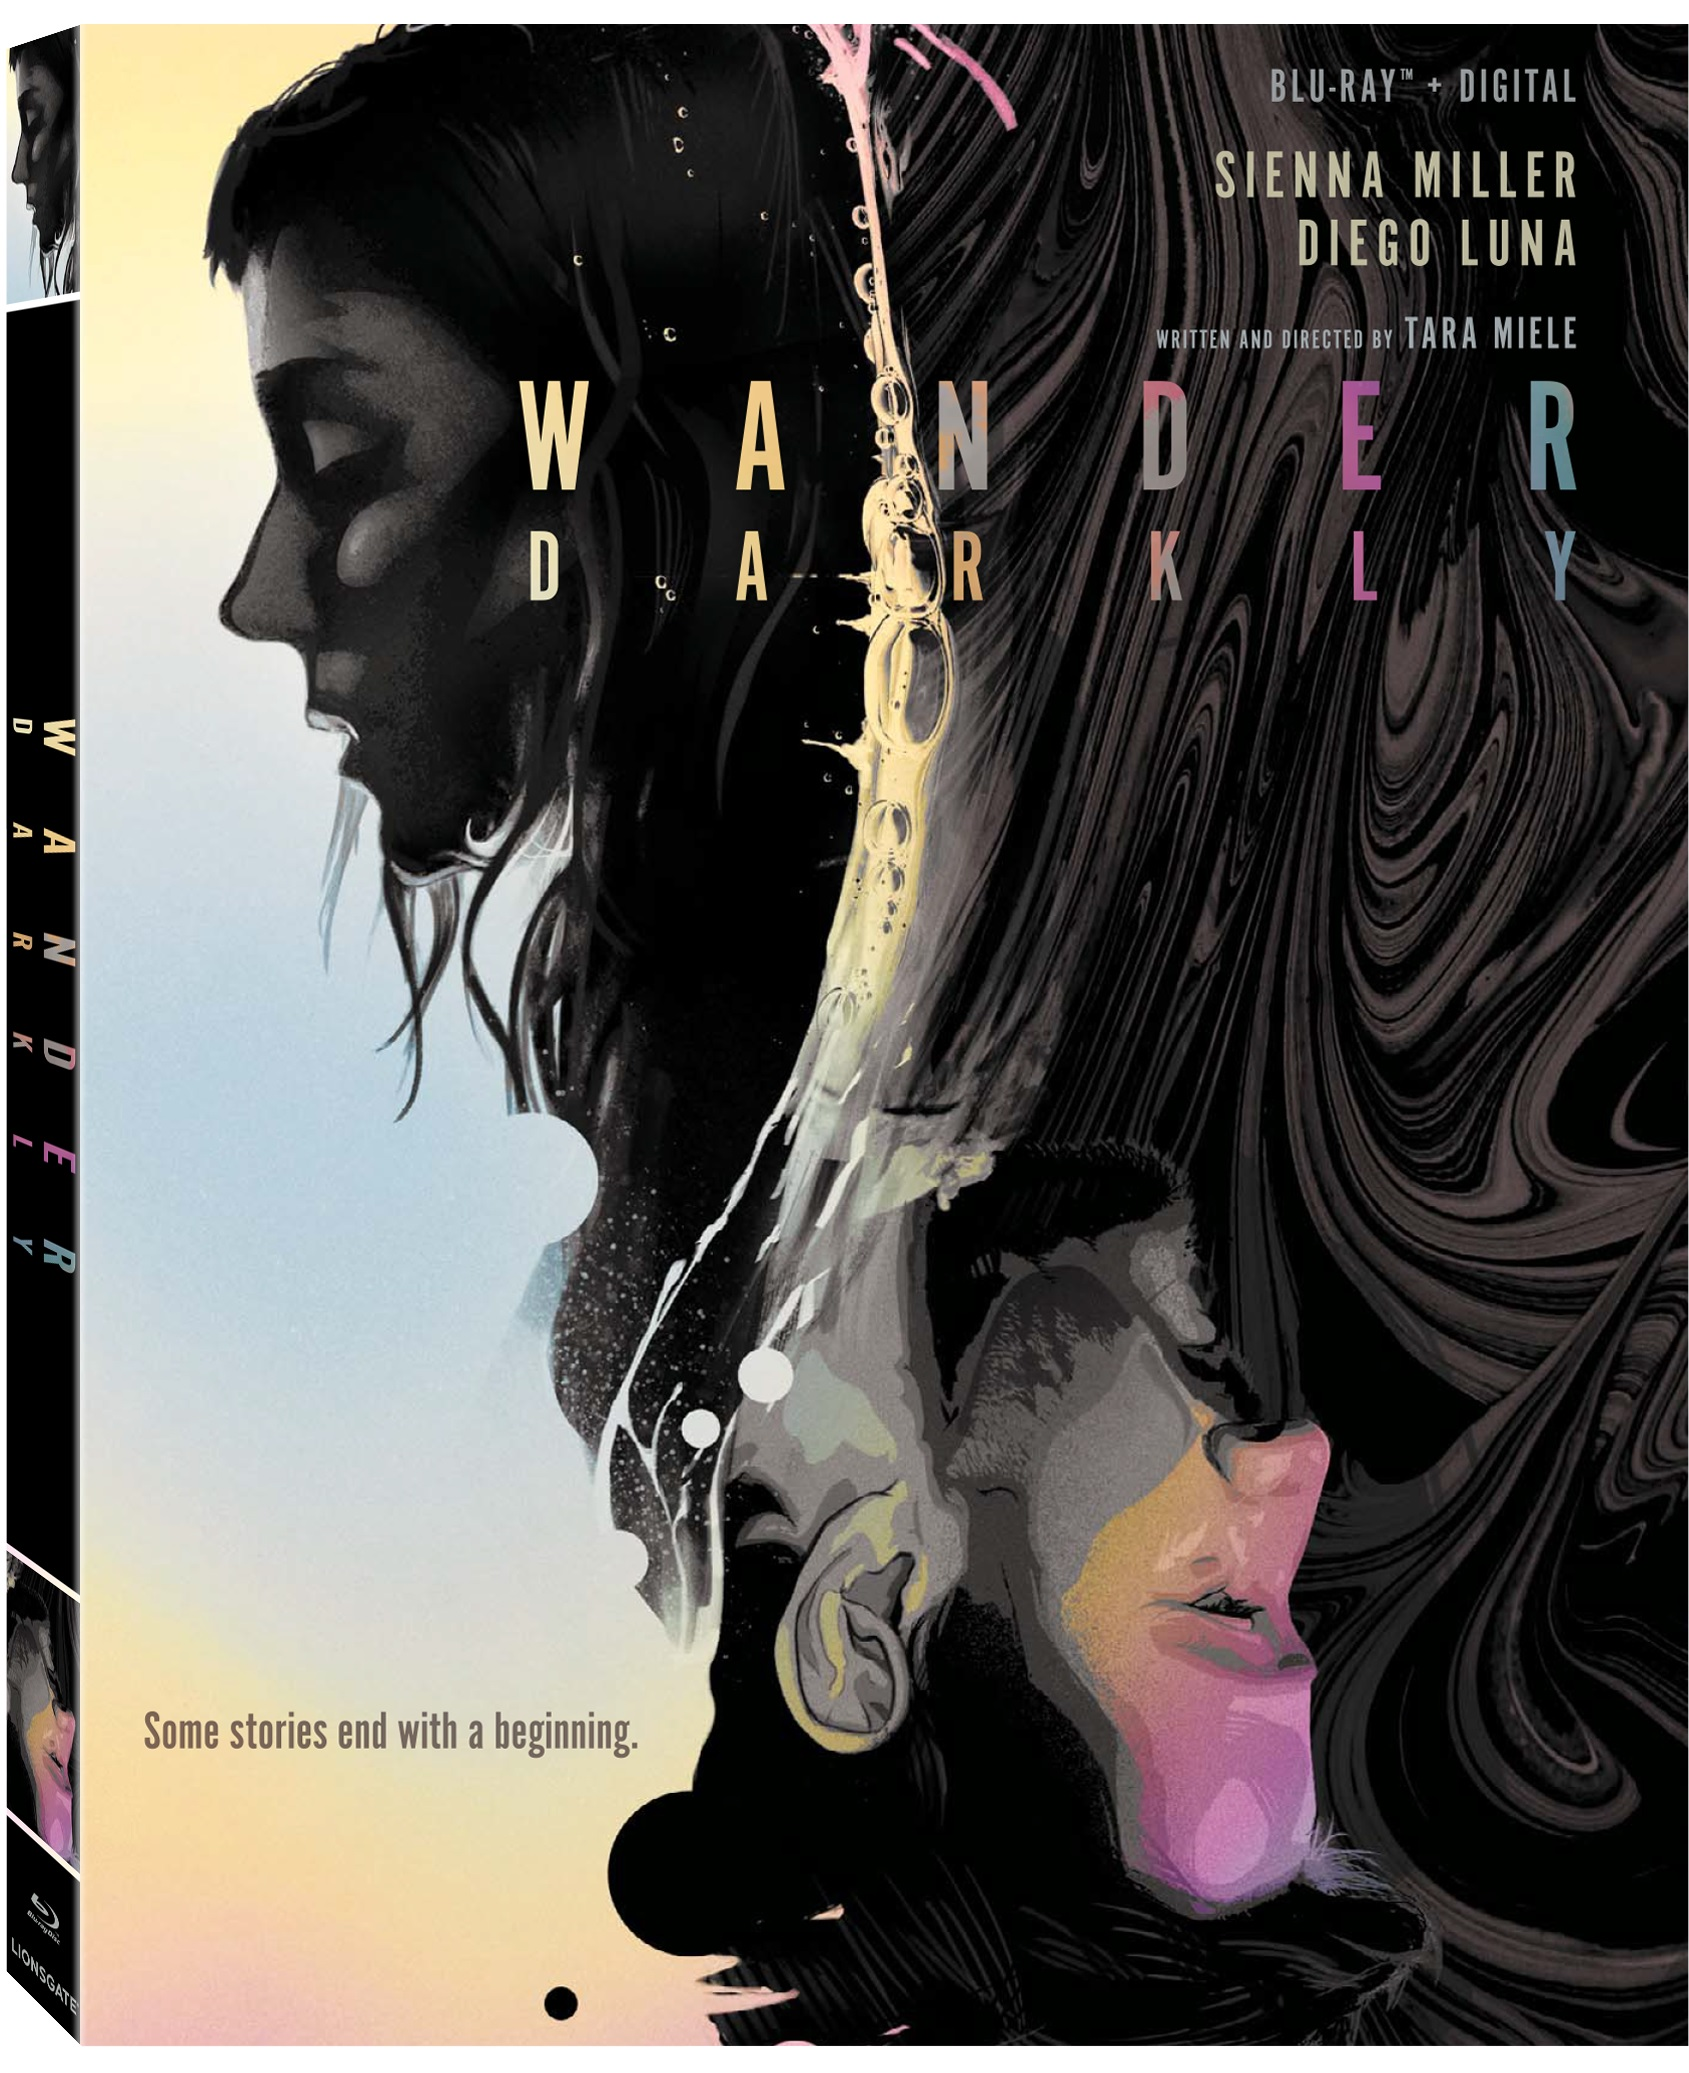 Wander Darkly Blu-ray Review